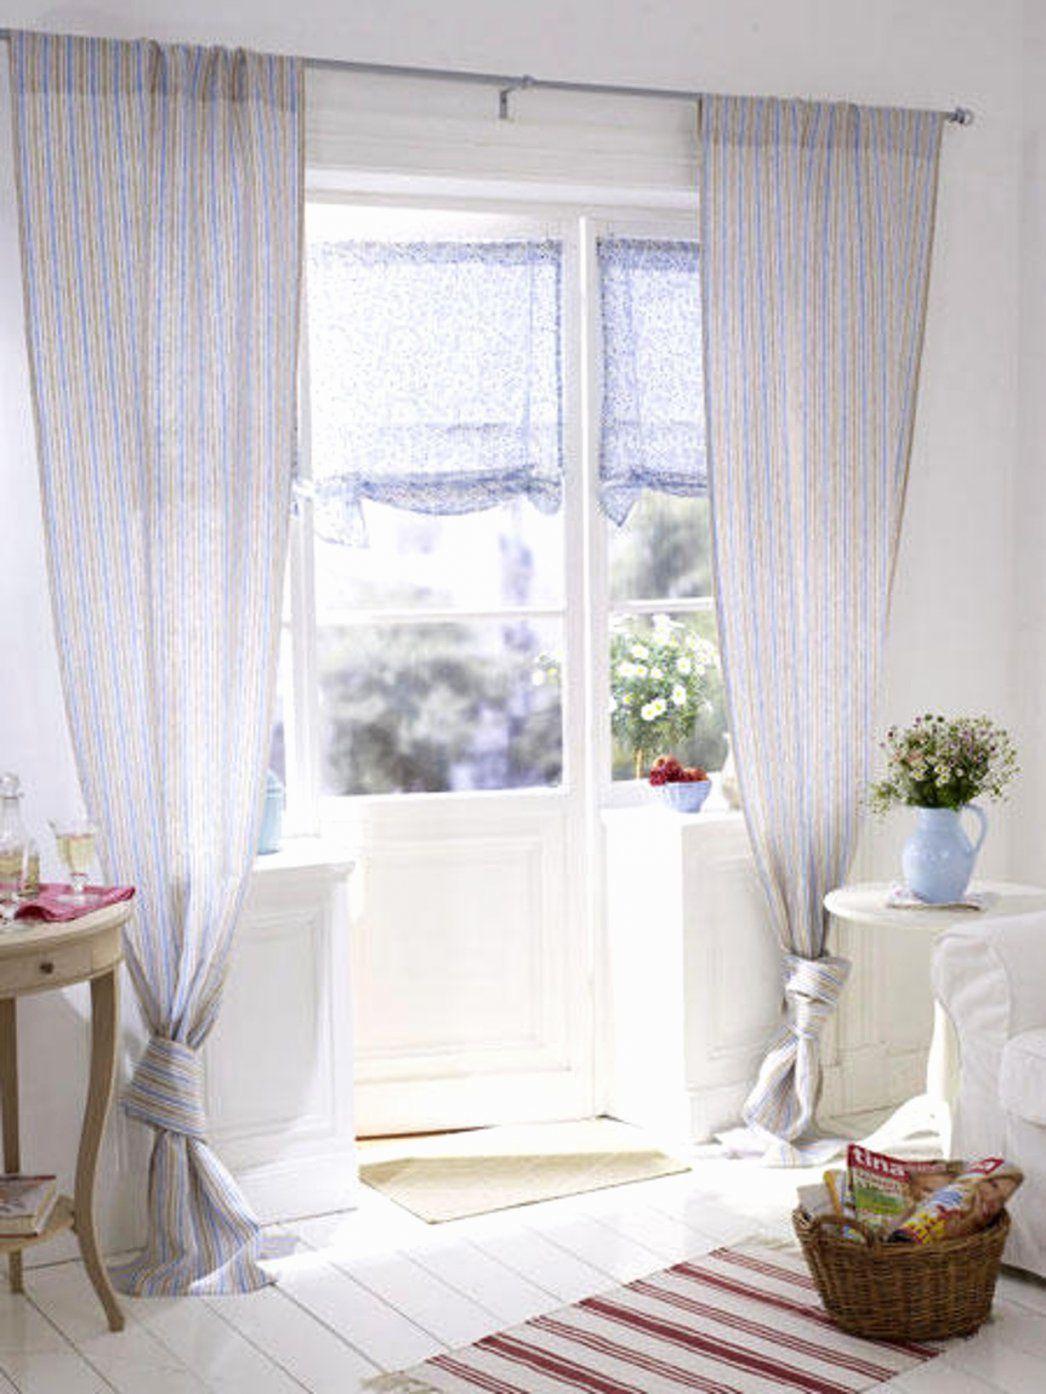 gardinen aus polen home ideen. Black Bedroom Furniture Sets. Home Design Ideas